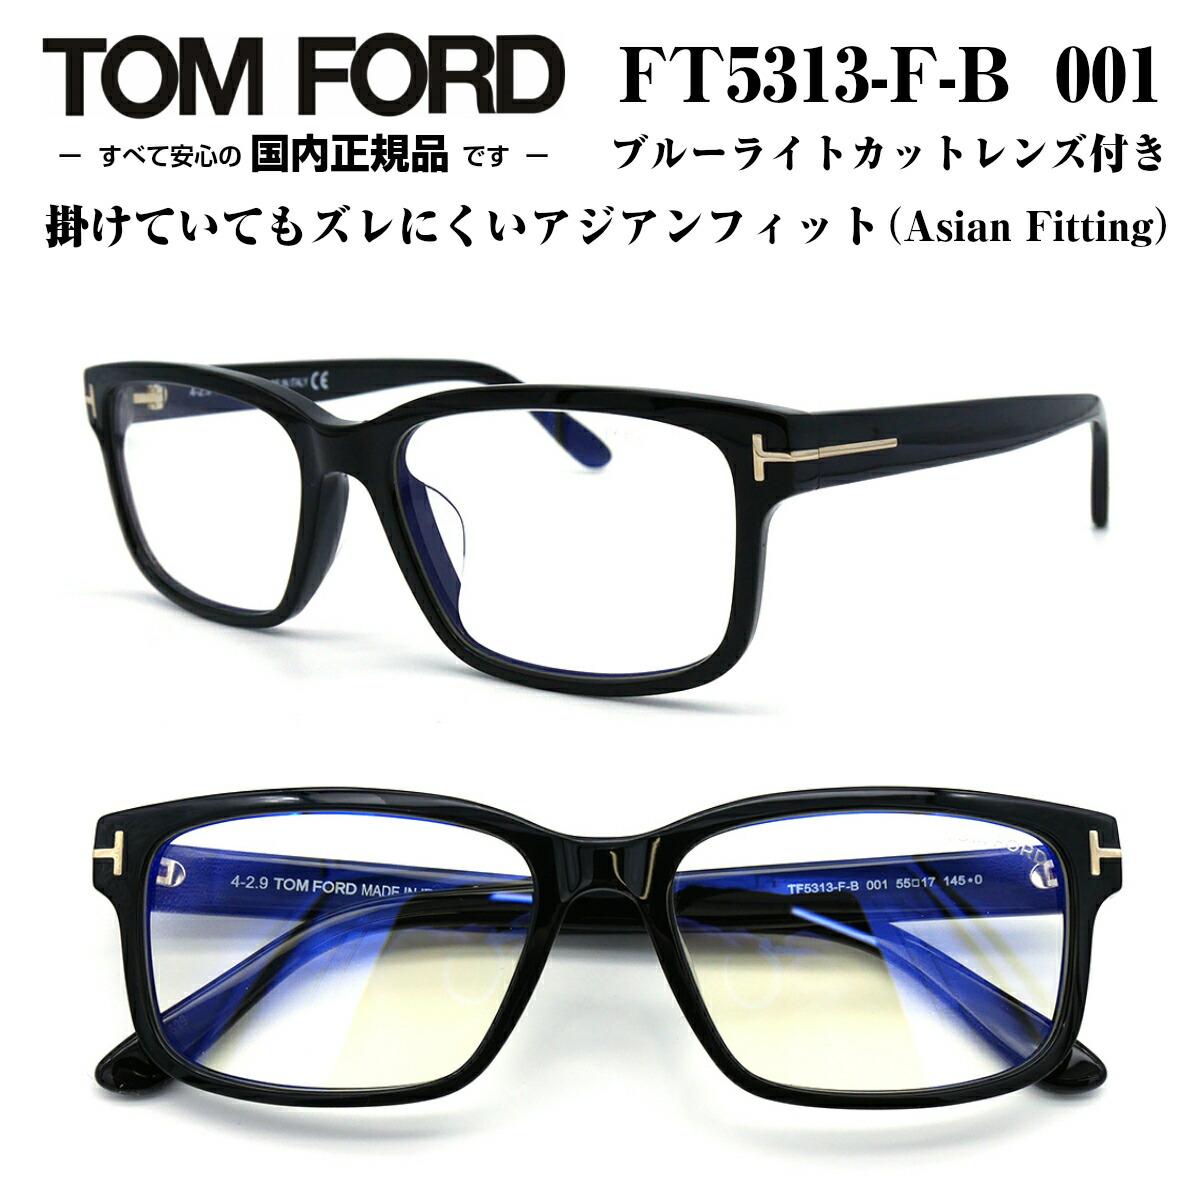 TOM FORD トムフォード FT5313FB-55001 (TF5313FB-55001) 55サイズ メガネ 眼鏡 めがね フレーム アジアンフィット ブルーライトカットレンズ付き ダテメガネ 度なし 付属 正規品 度付き対応 TOMFORD メンズ 男性 おしゃれ